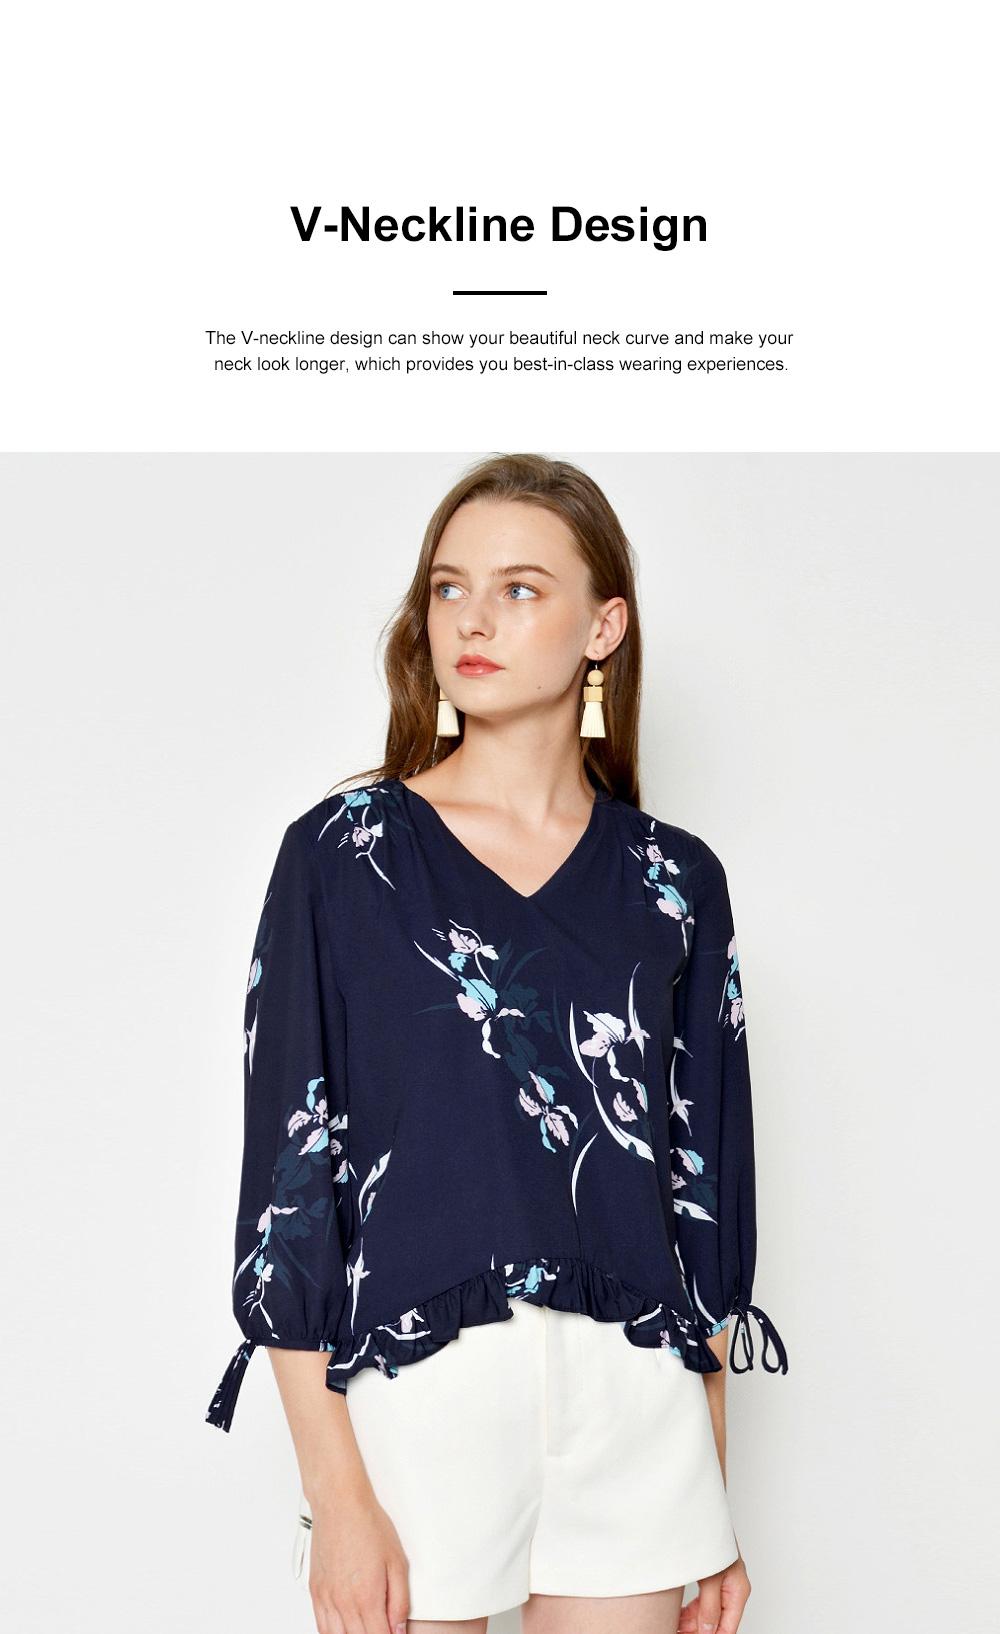 Fashion Navy Blue Printing Three Quarter Sleeves Women Tops, V-neckline Chiffon with Stringy Selvedge for Ladies 1